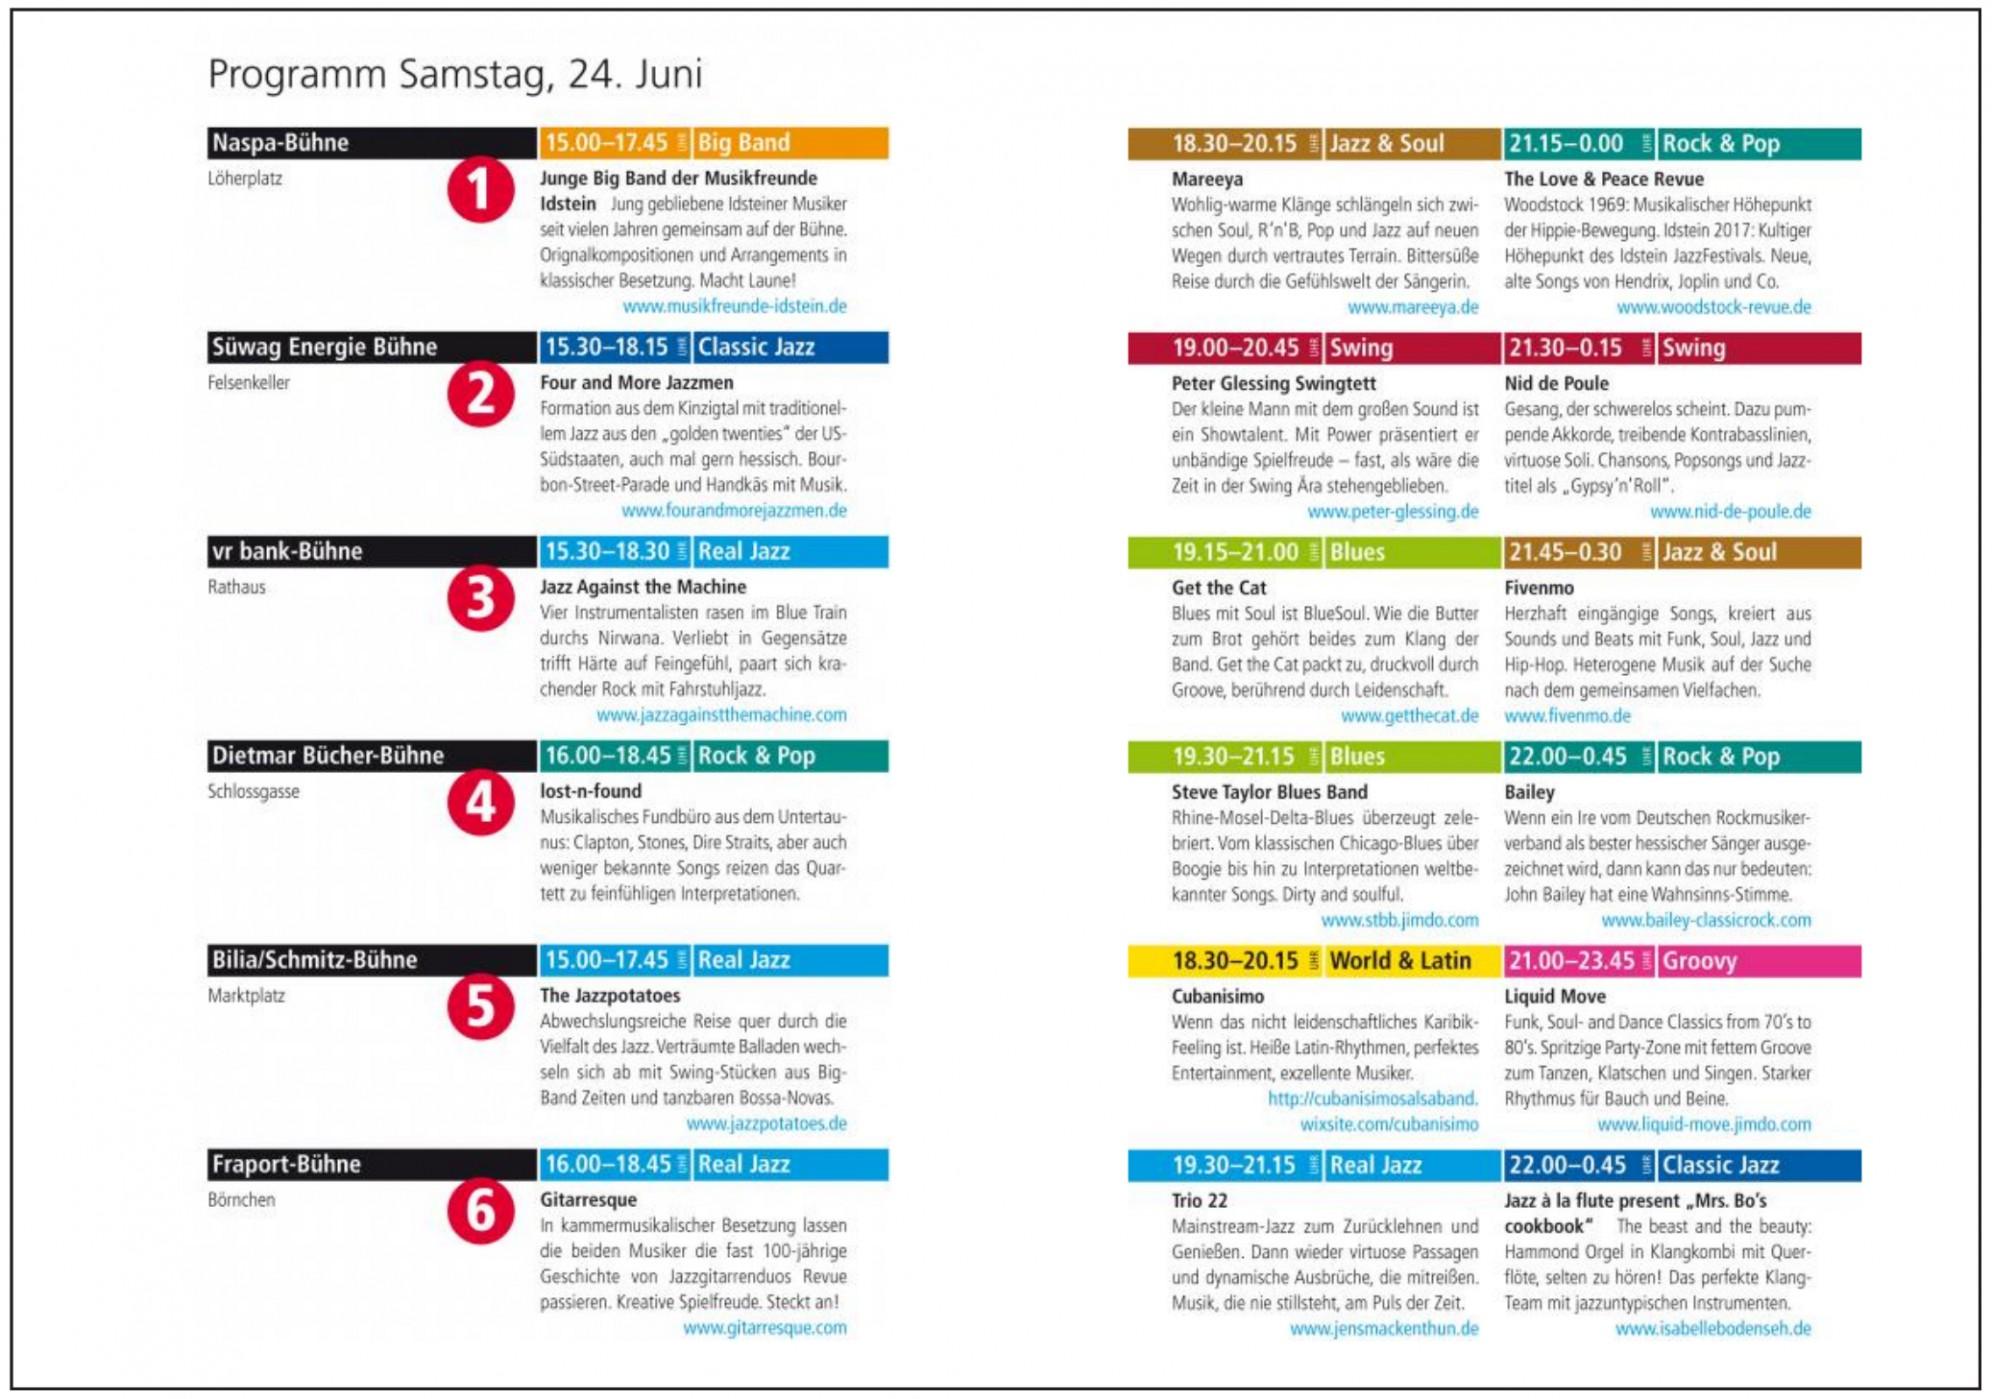 Programm Samstag, 24. Juni